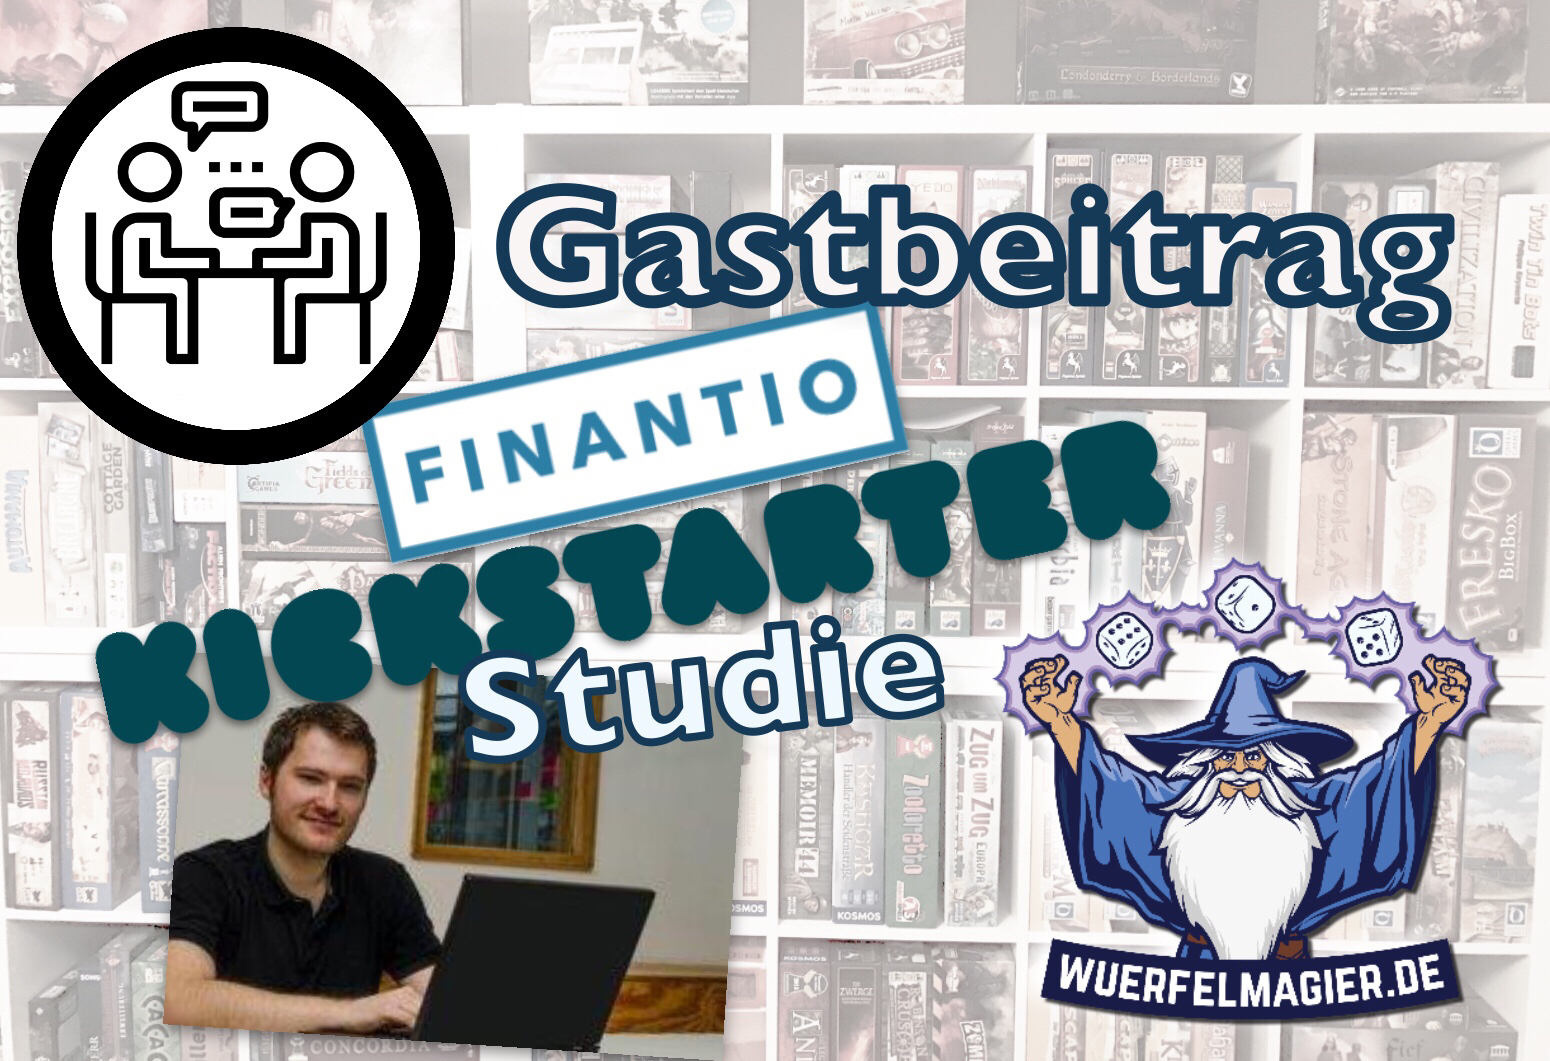 Finantio Kickstarter Studie Würfelmagier Wuerfelmagier Gastbeitrag